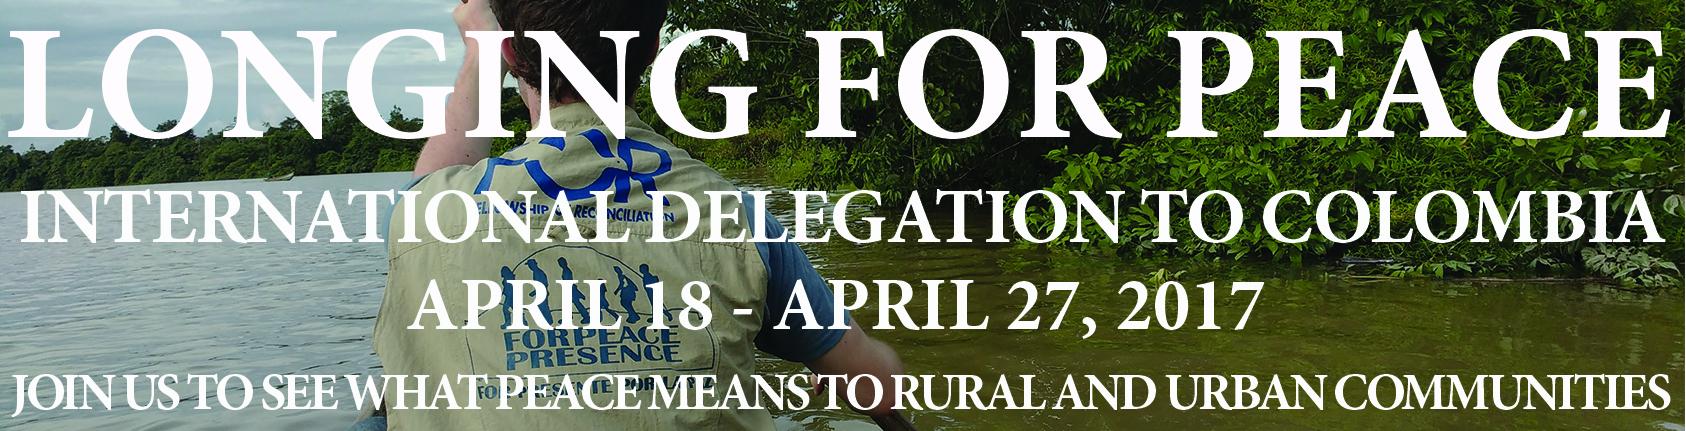 delegation-brochure-austria-april-18-27